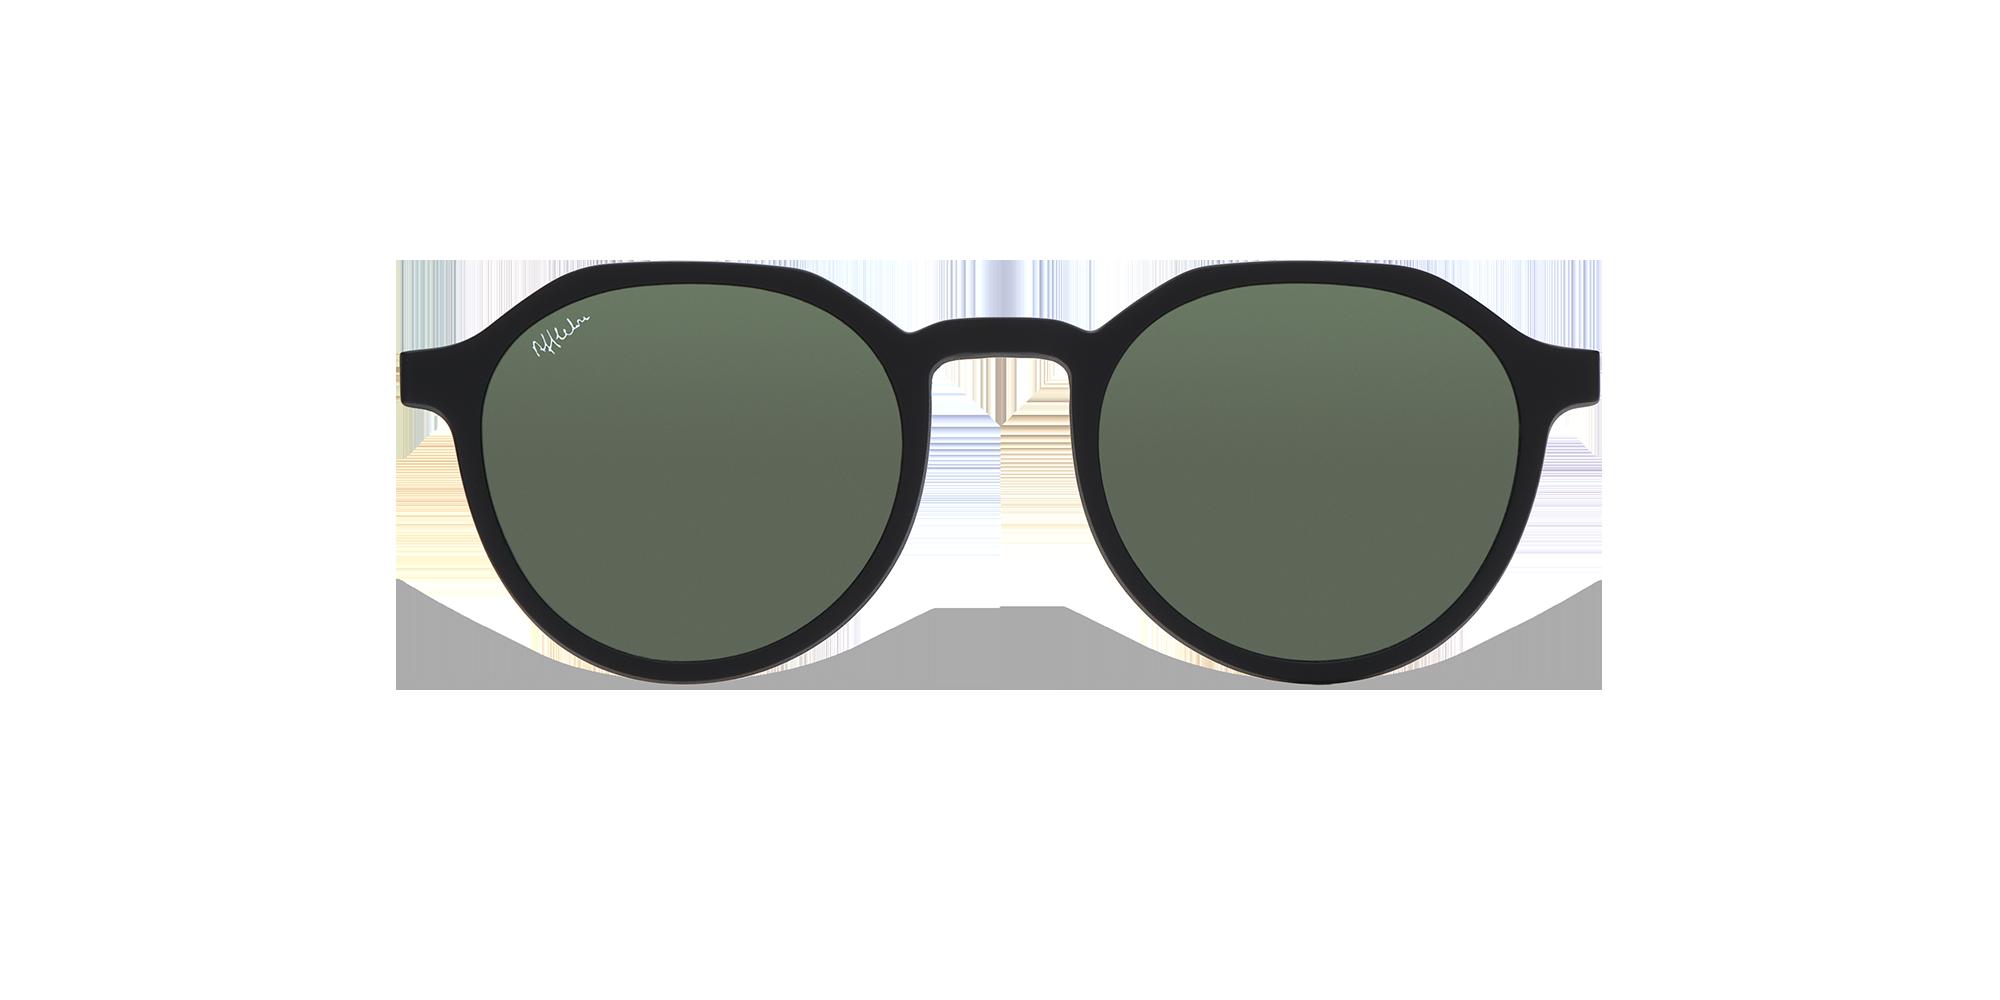 afflelou/france/products/smart_clip/clips_glasses/07630036428900_face.png